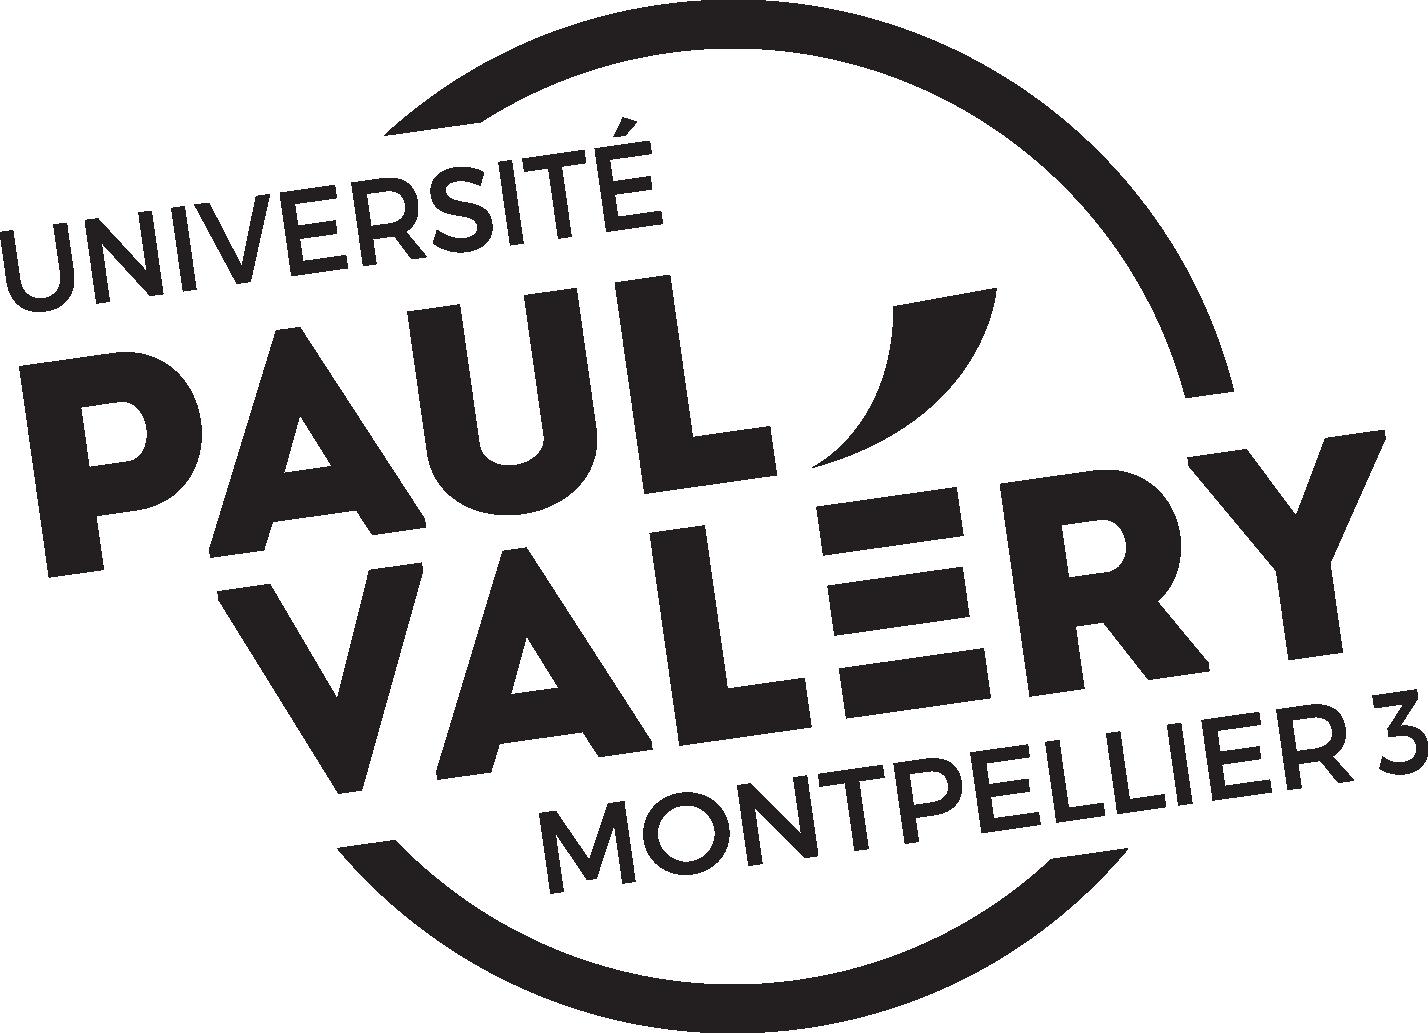 Université Paul-Valéry